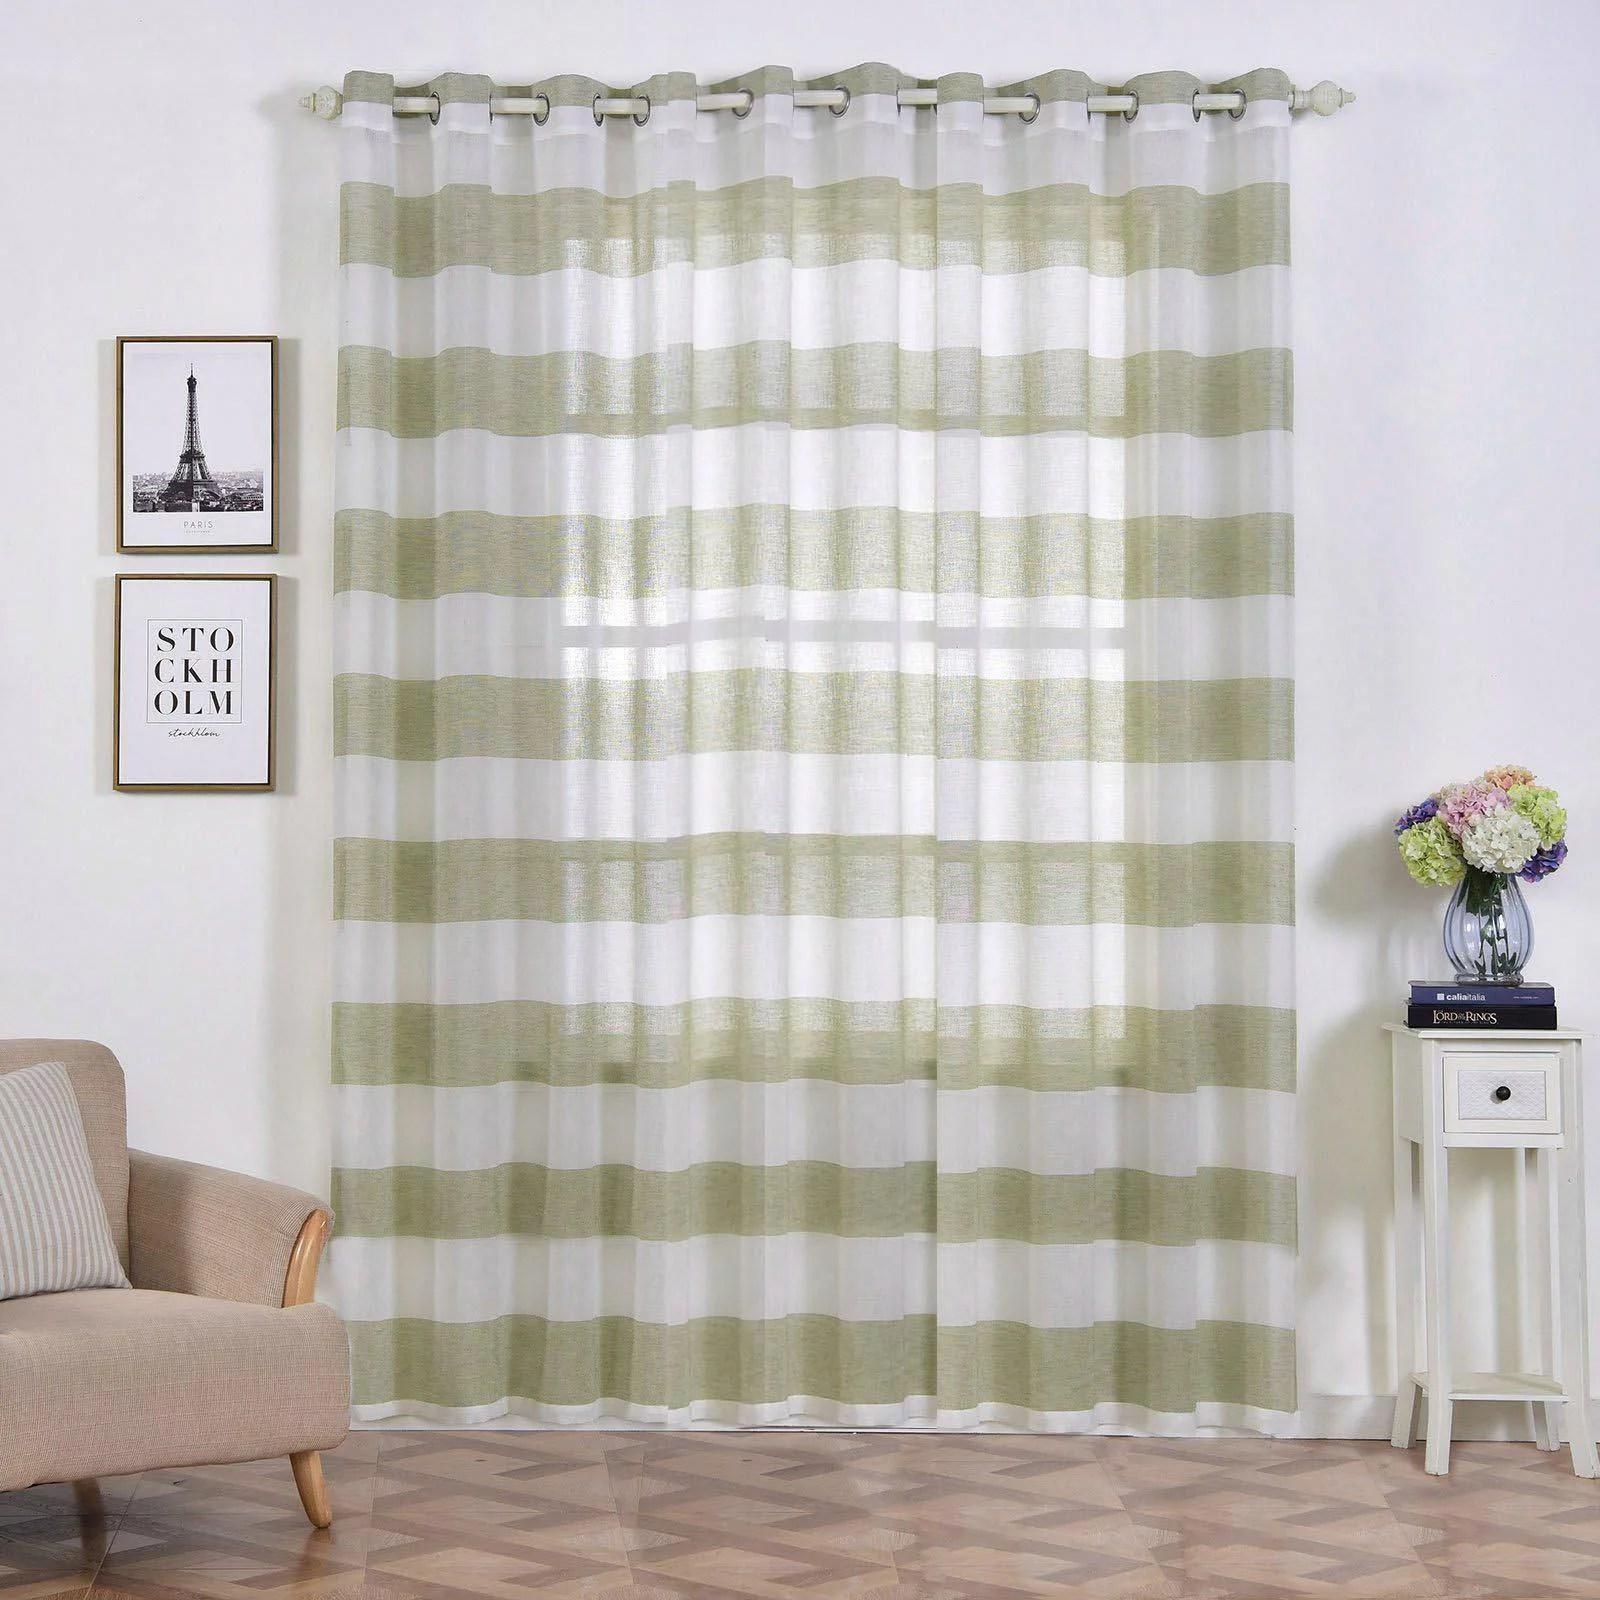 https www walmart com ip 2 pack 52 x 96 cabana print faux linen curtain panels with chrome grommet white sage green 991230198